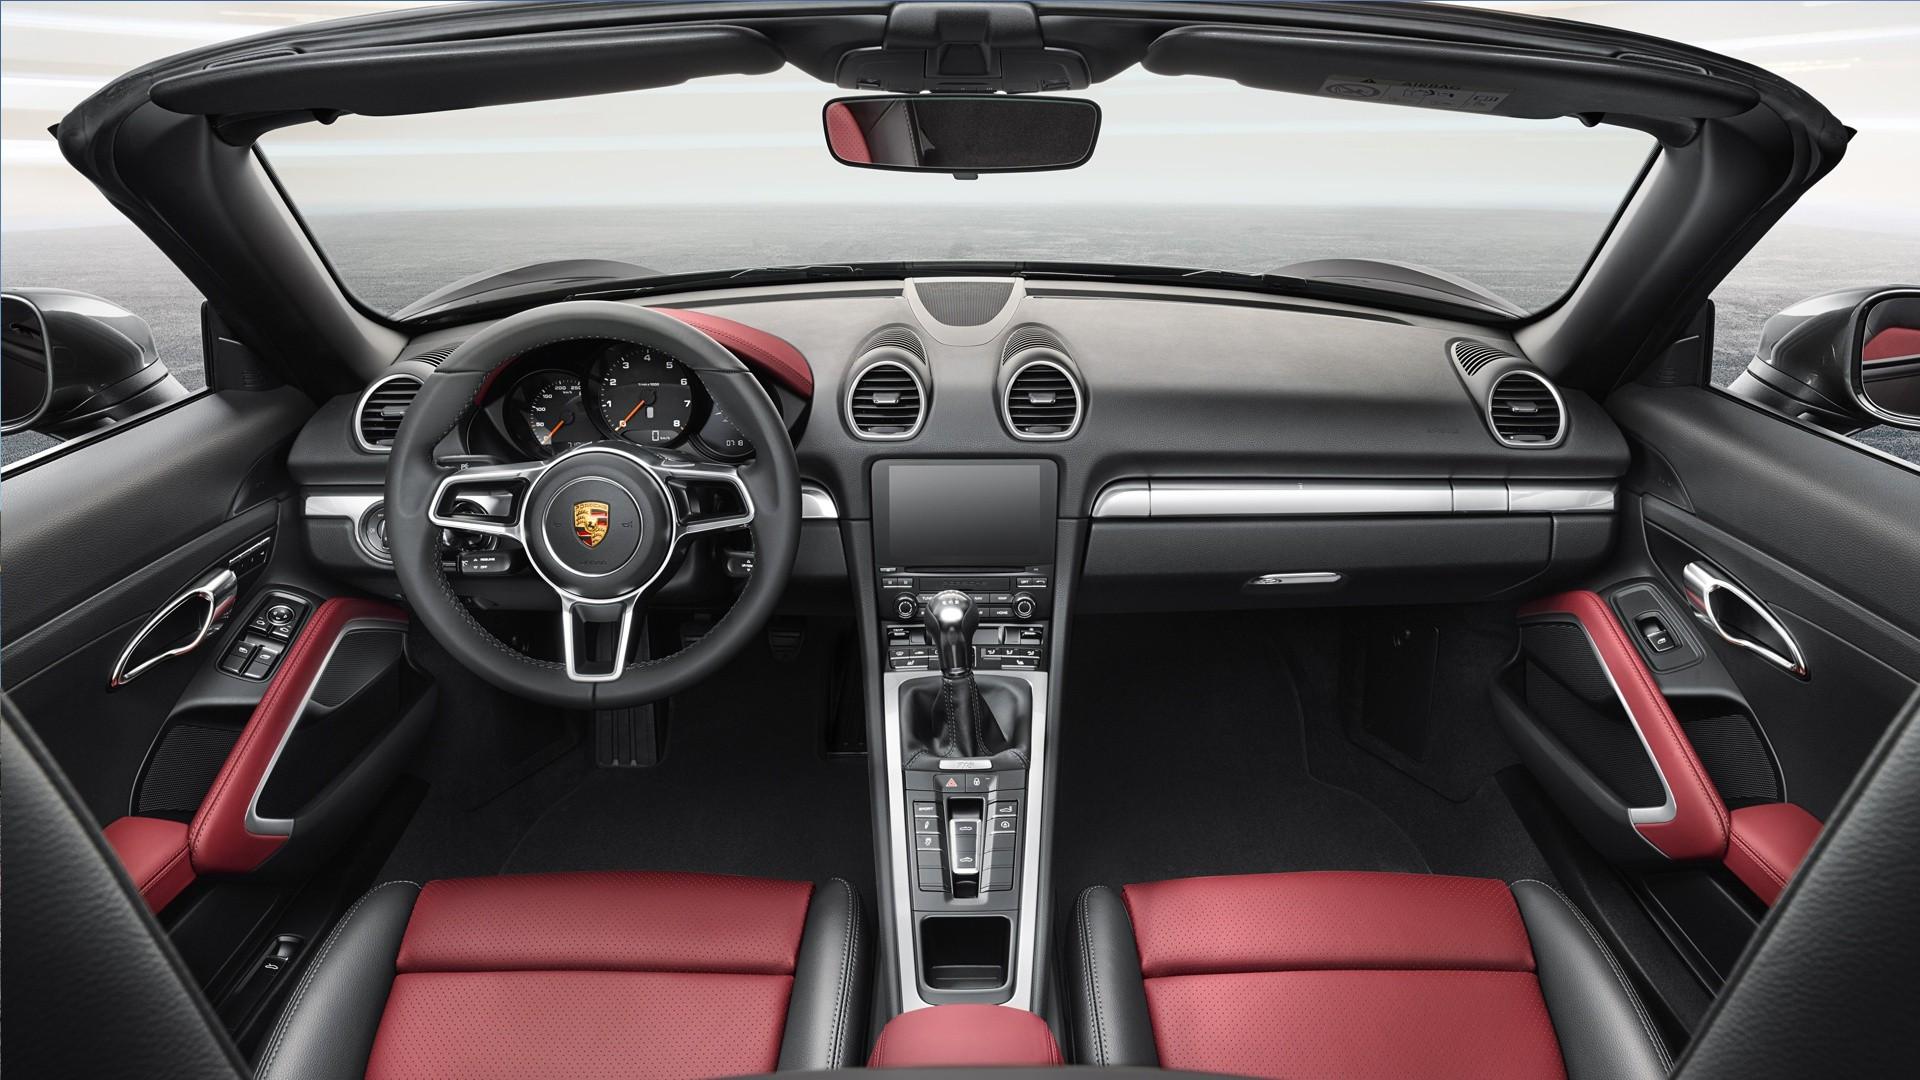 Porsche Boxster Engine Diagram Porsche Boxster Rental Miami We are Porsche Specialists All Of Porsche Boxster Engine Diagram